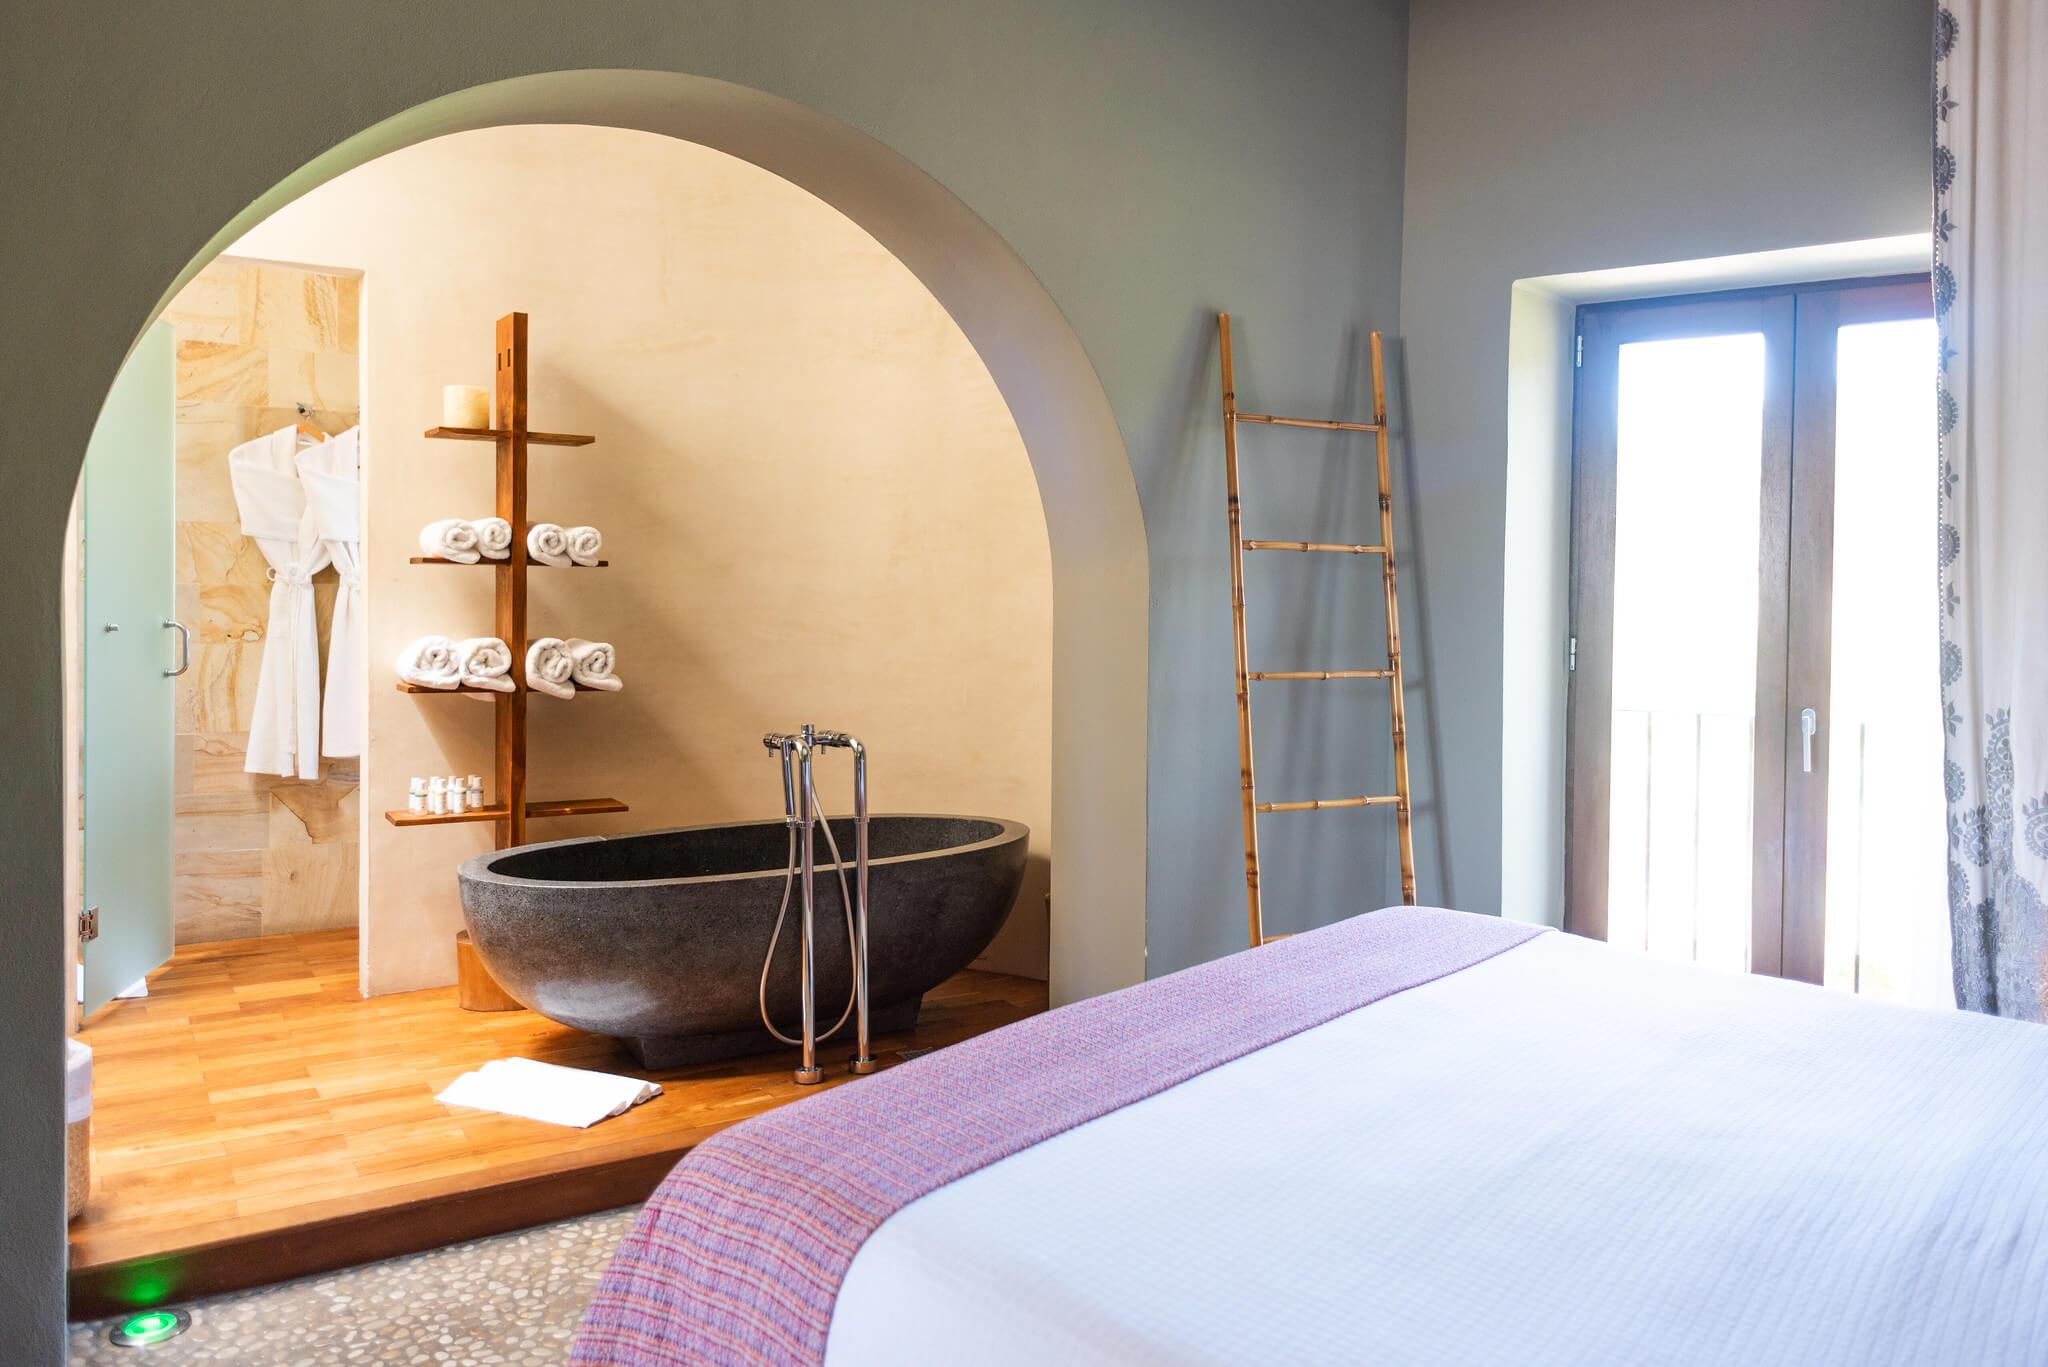 https://www.white-ibiza.com/wp-content/uploads/2020/03/white-ibiza-boutique-hotels-the-giri-residence-2020-13.jpg